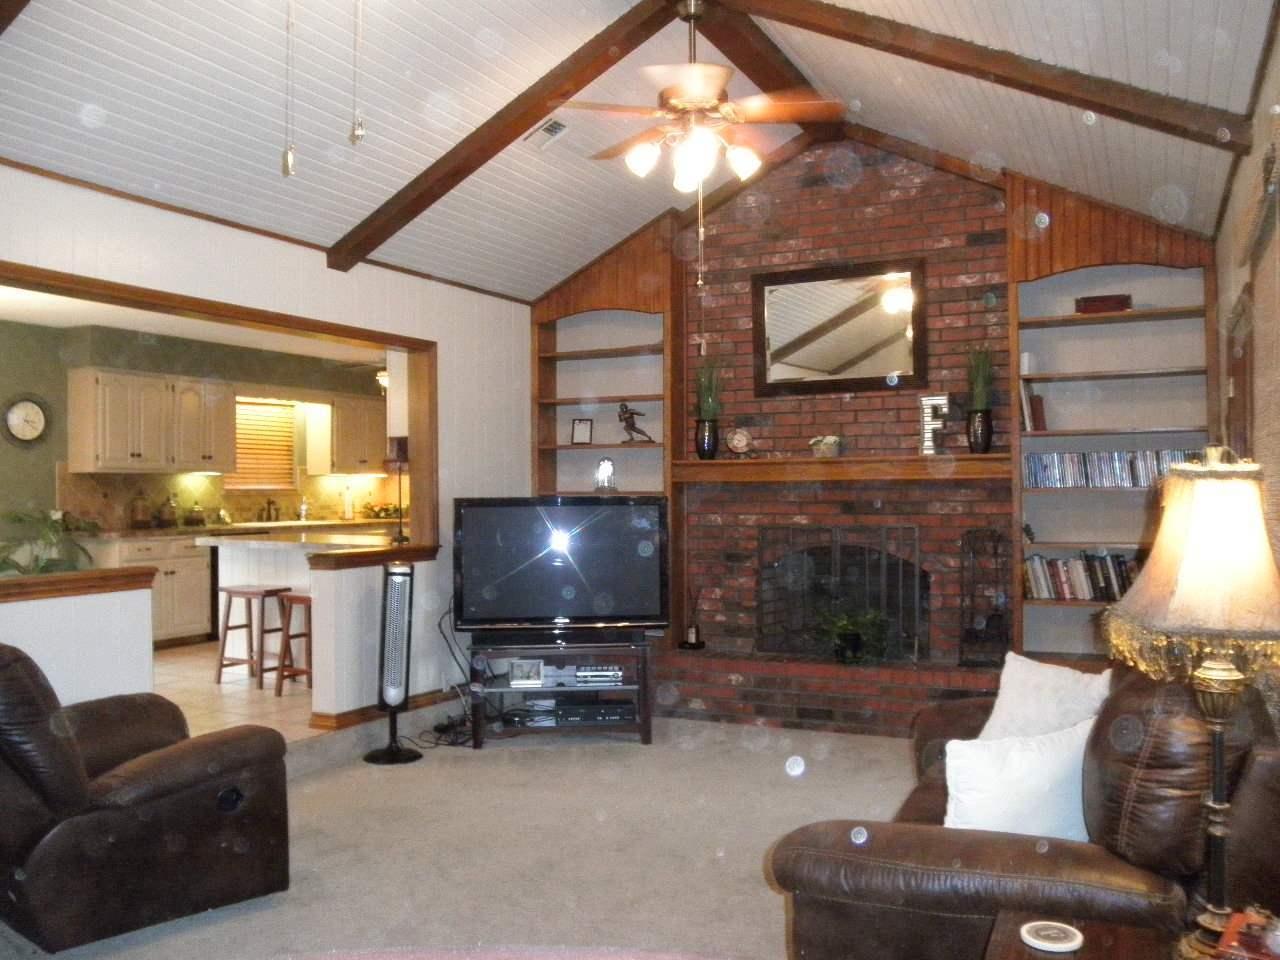 Sold Cross Sale W/ MLS | 2805 Ames  Ponca City, OK  2